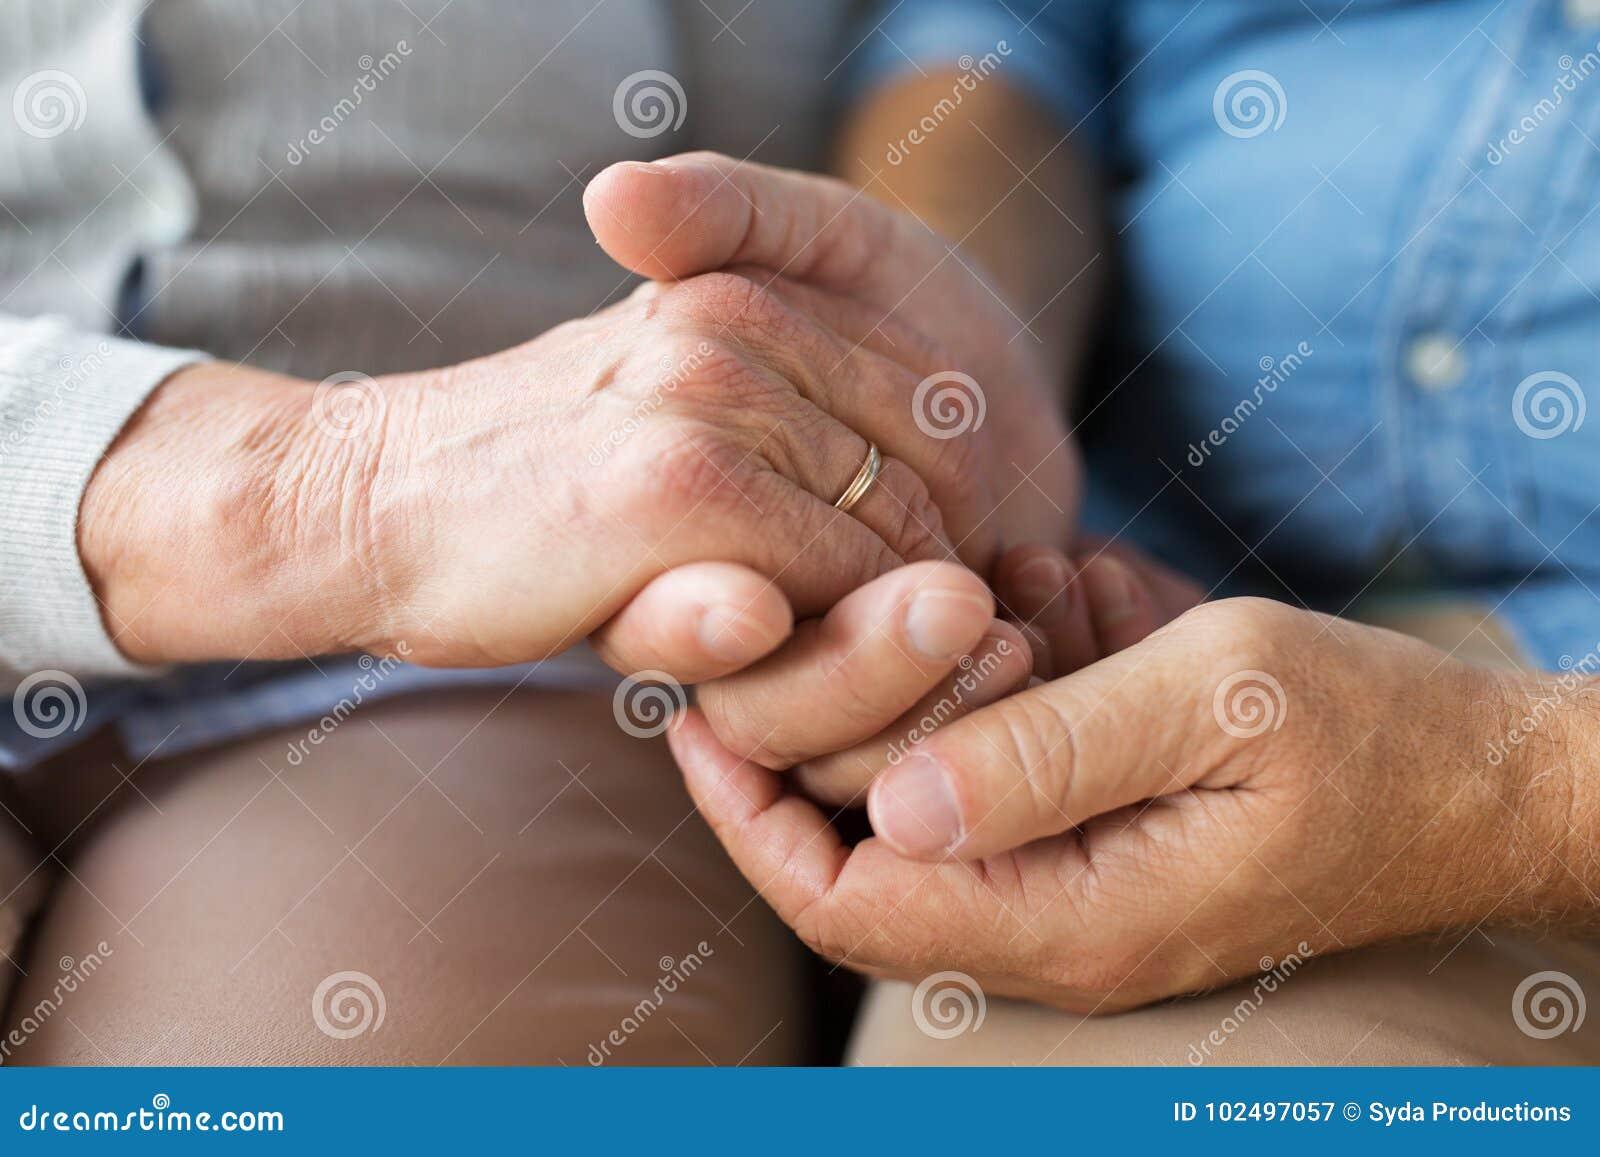 Close Up Senior Couple Holding Hands Stock Image Image of